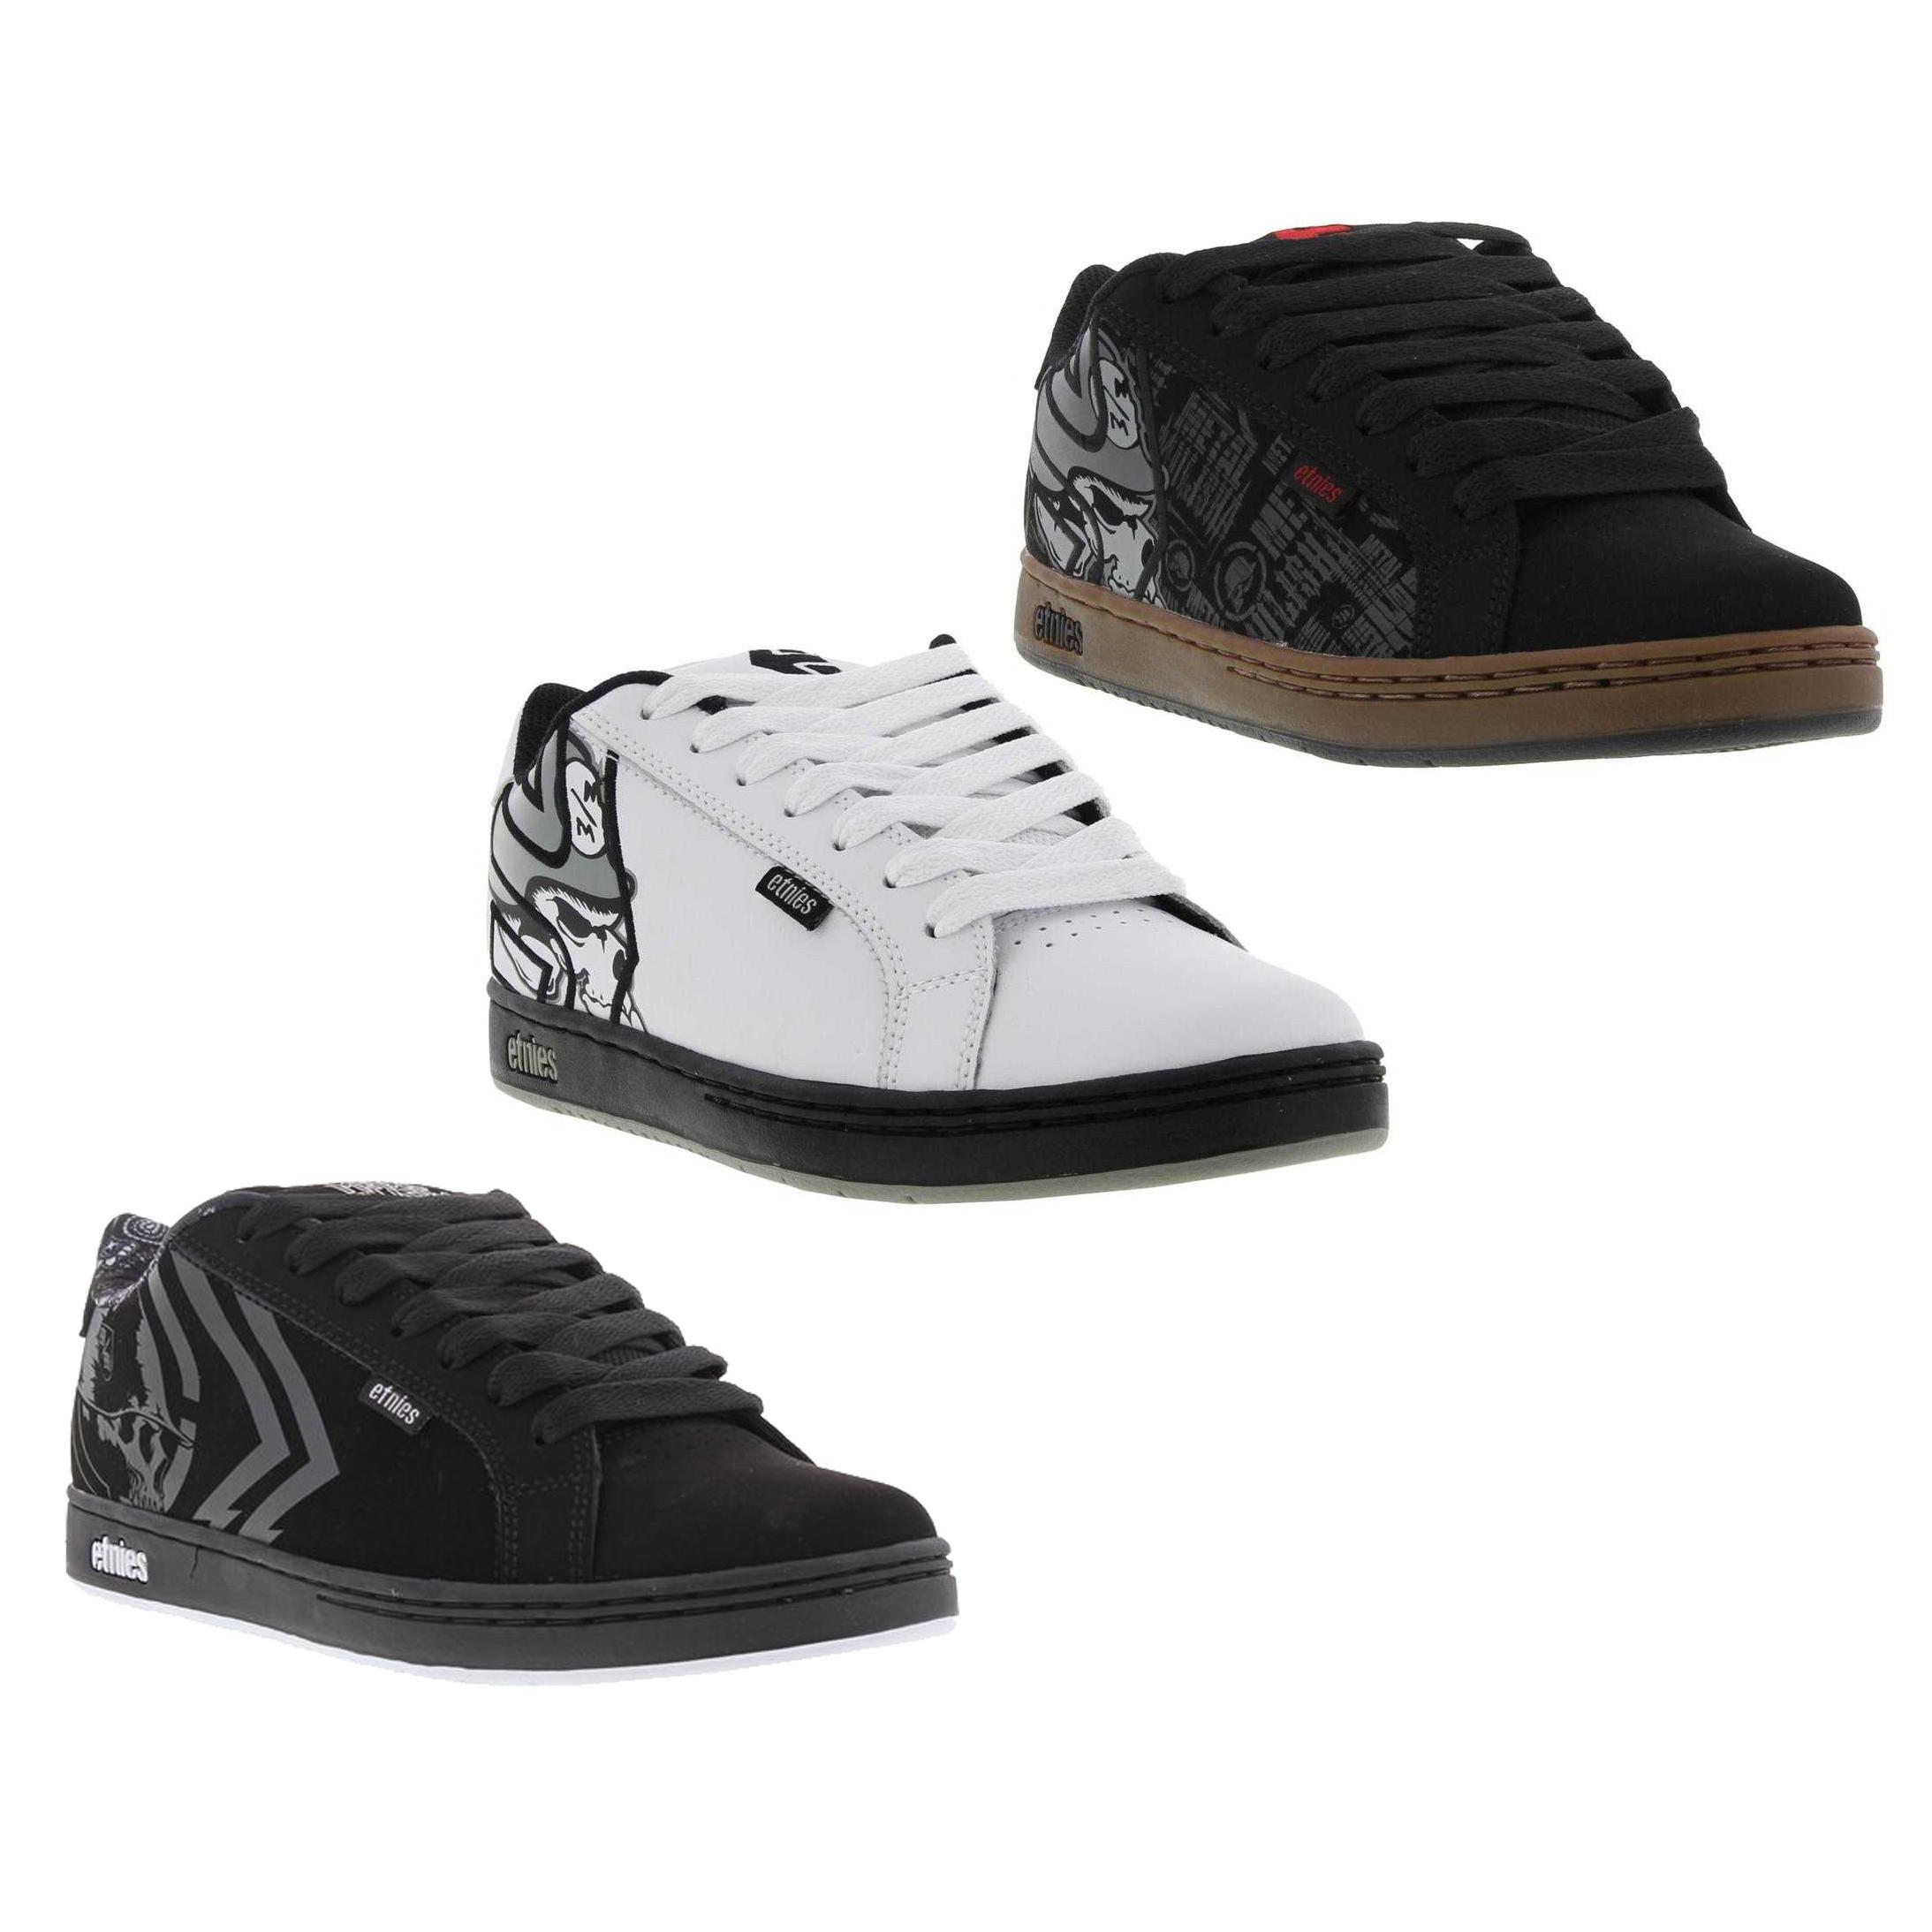 b078c730c52 Etnies Metal Mulisha Fader Mens Black White Skate Shoes Trainers ...